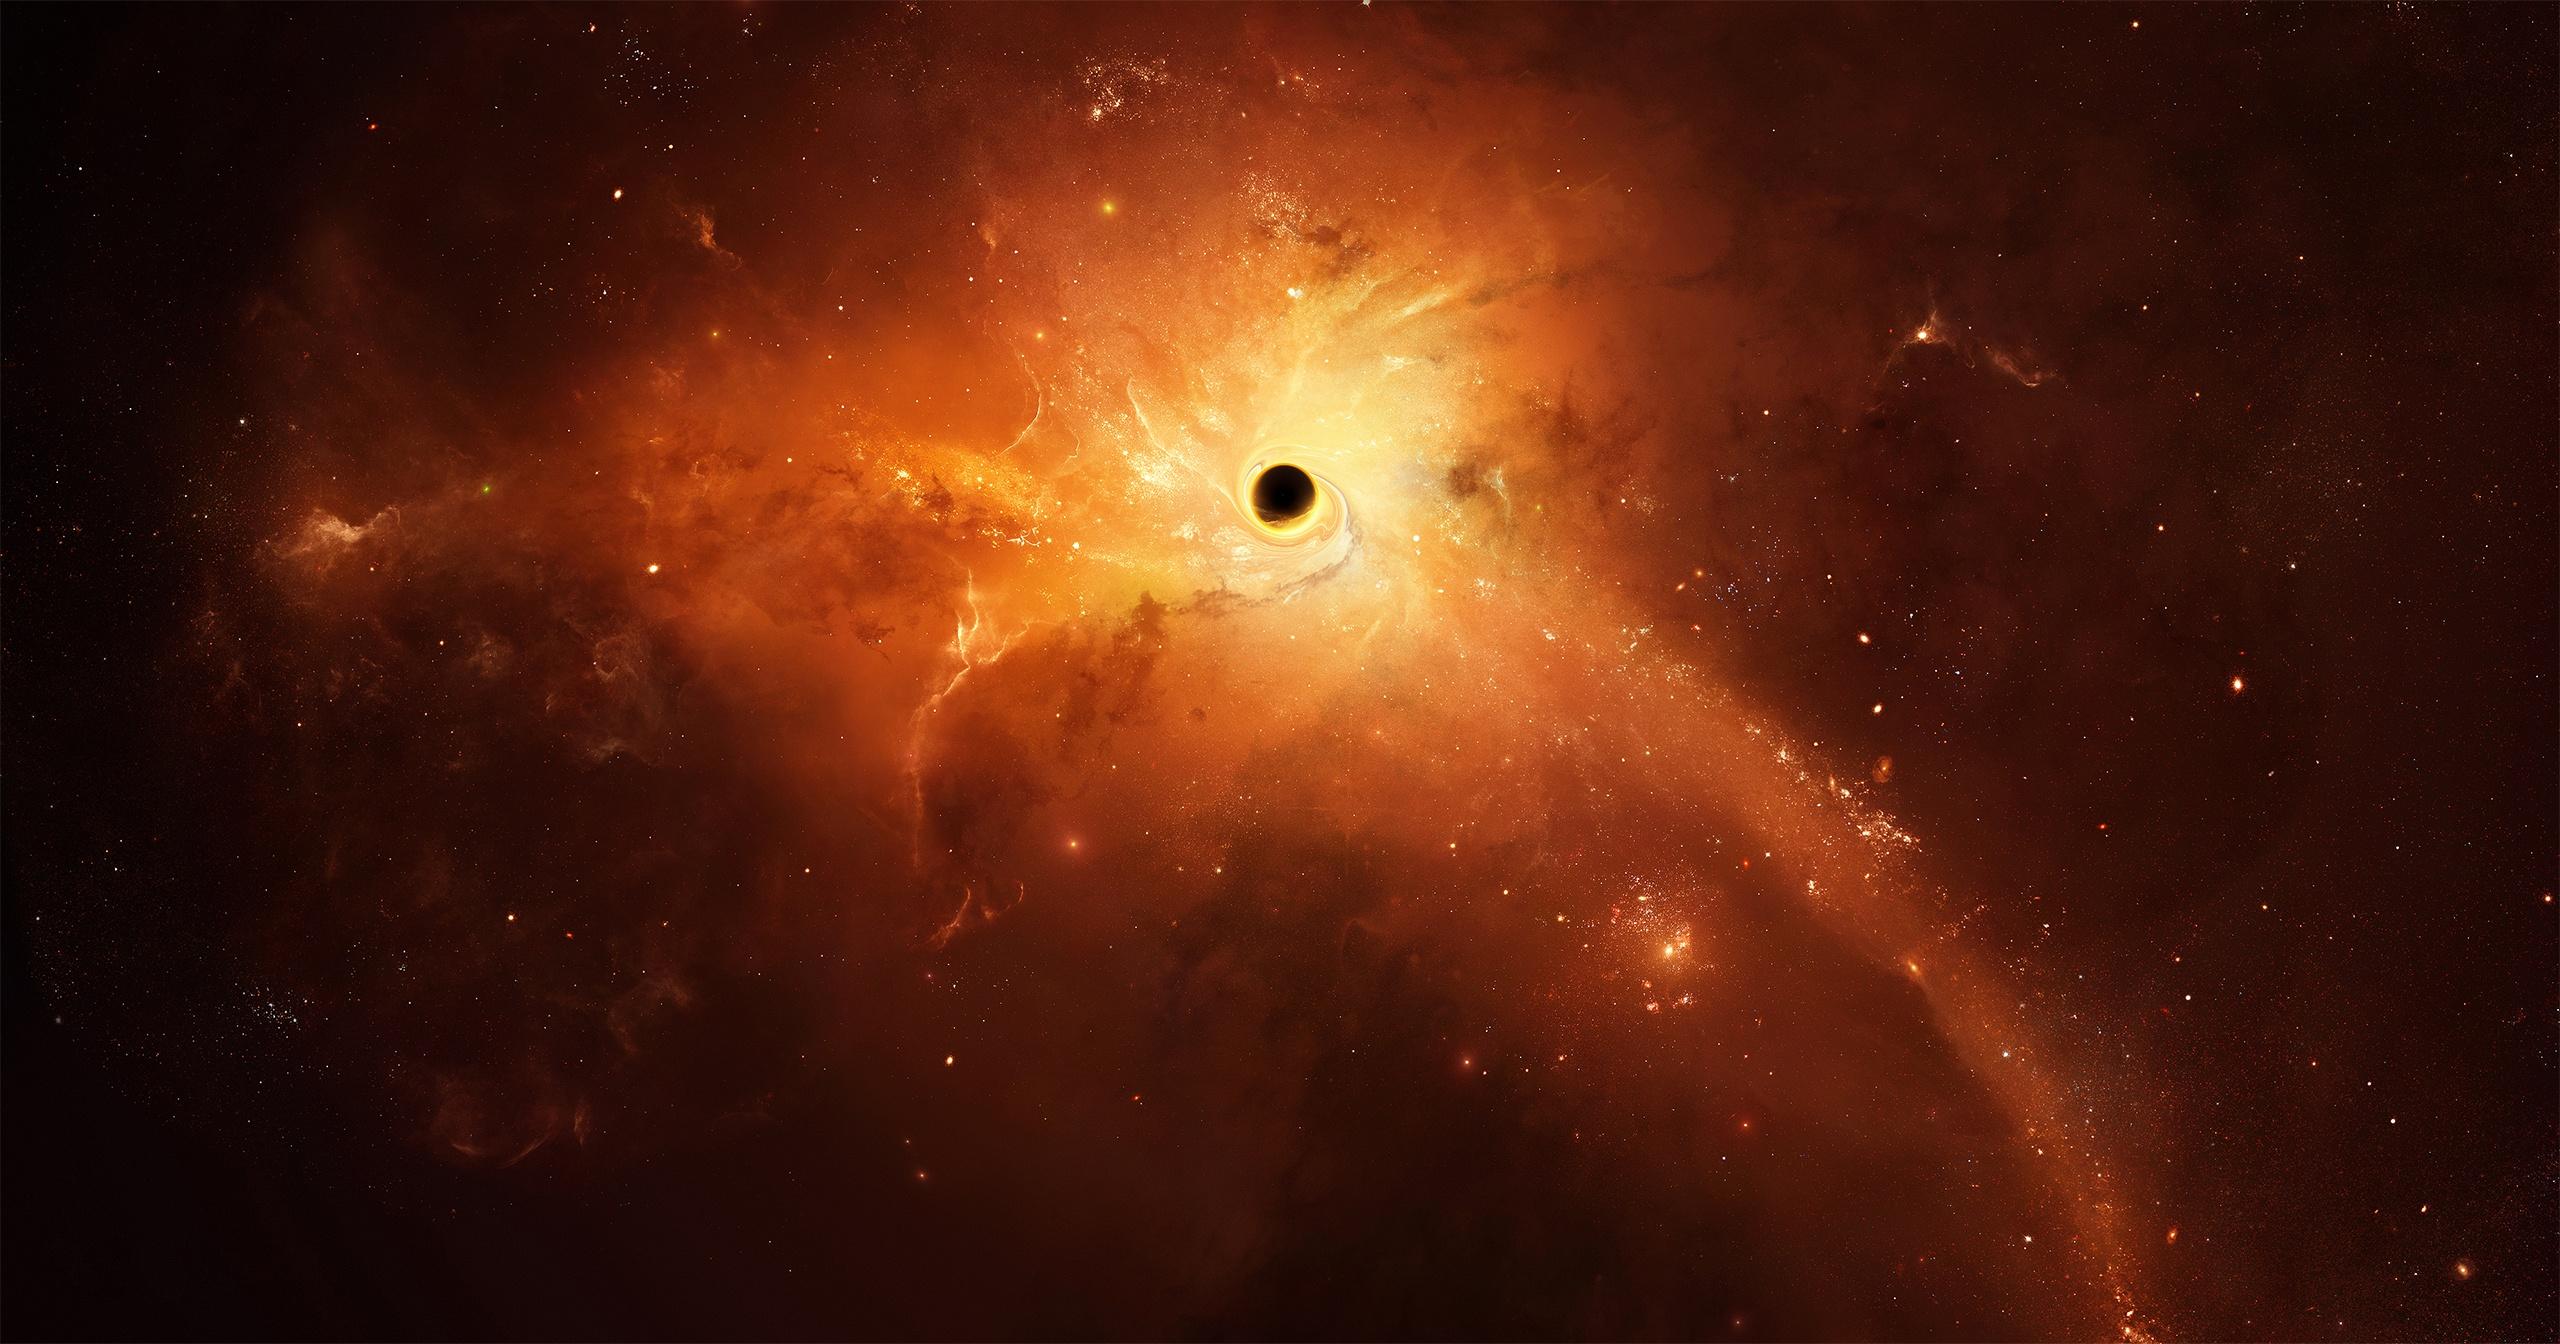 2560x1440 Black Holes Space 1440P Resolution HD 4k ...